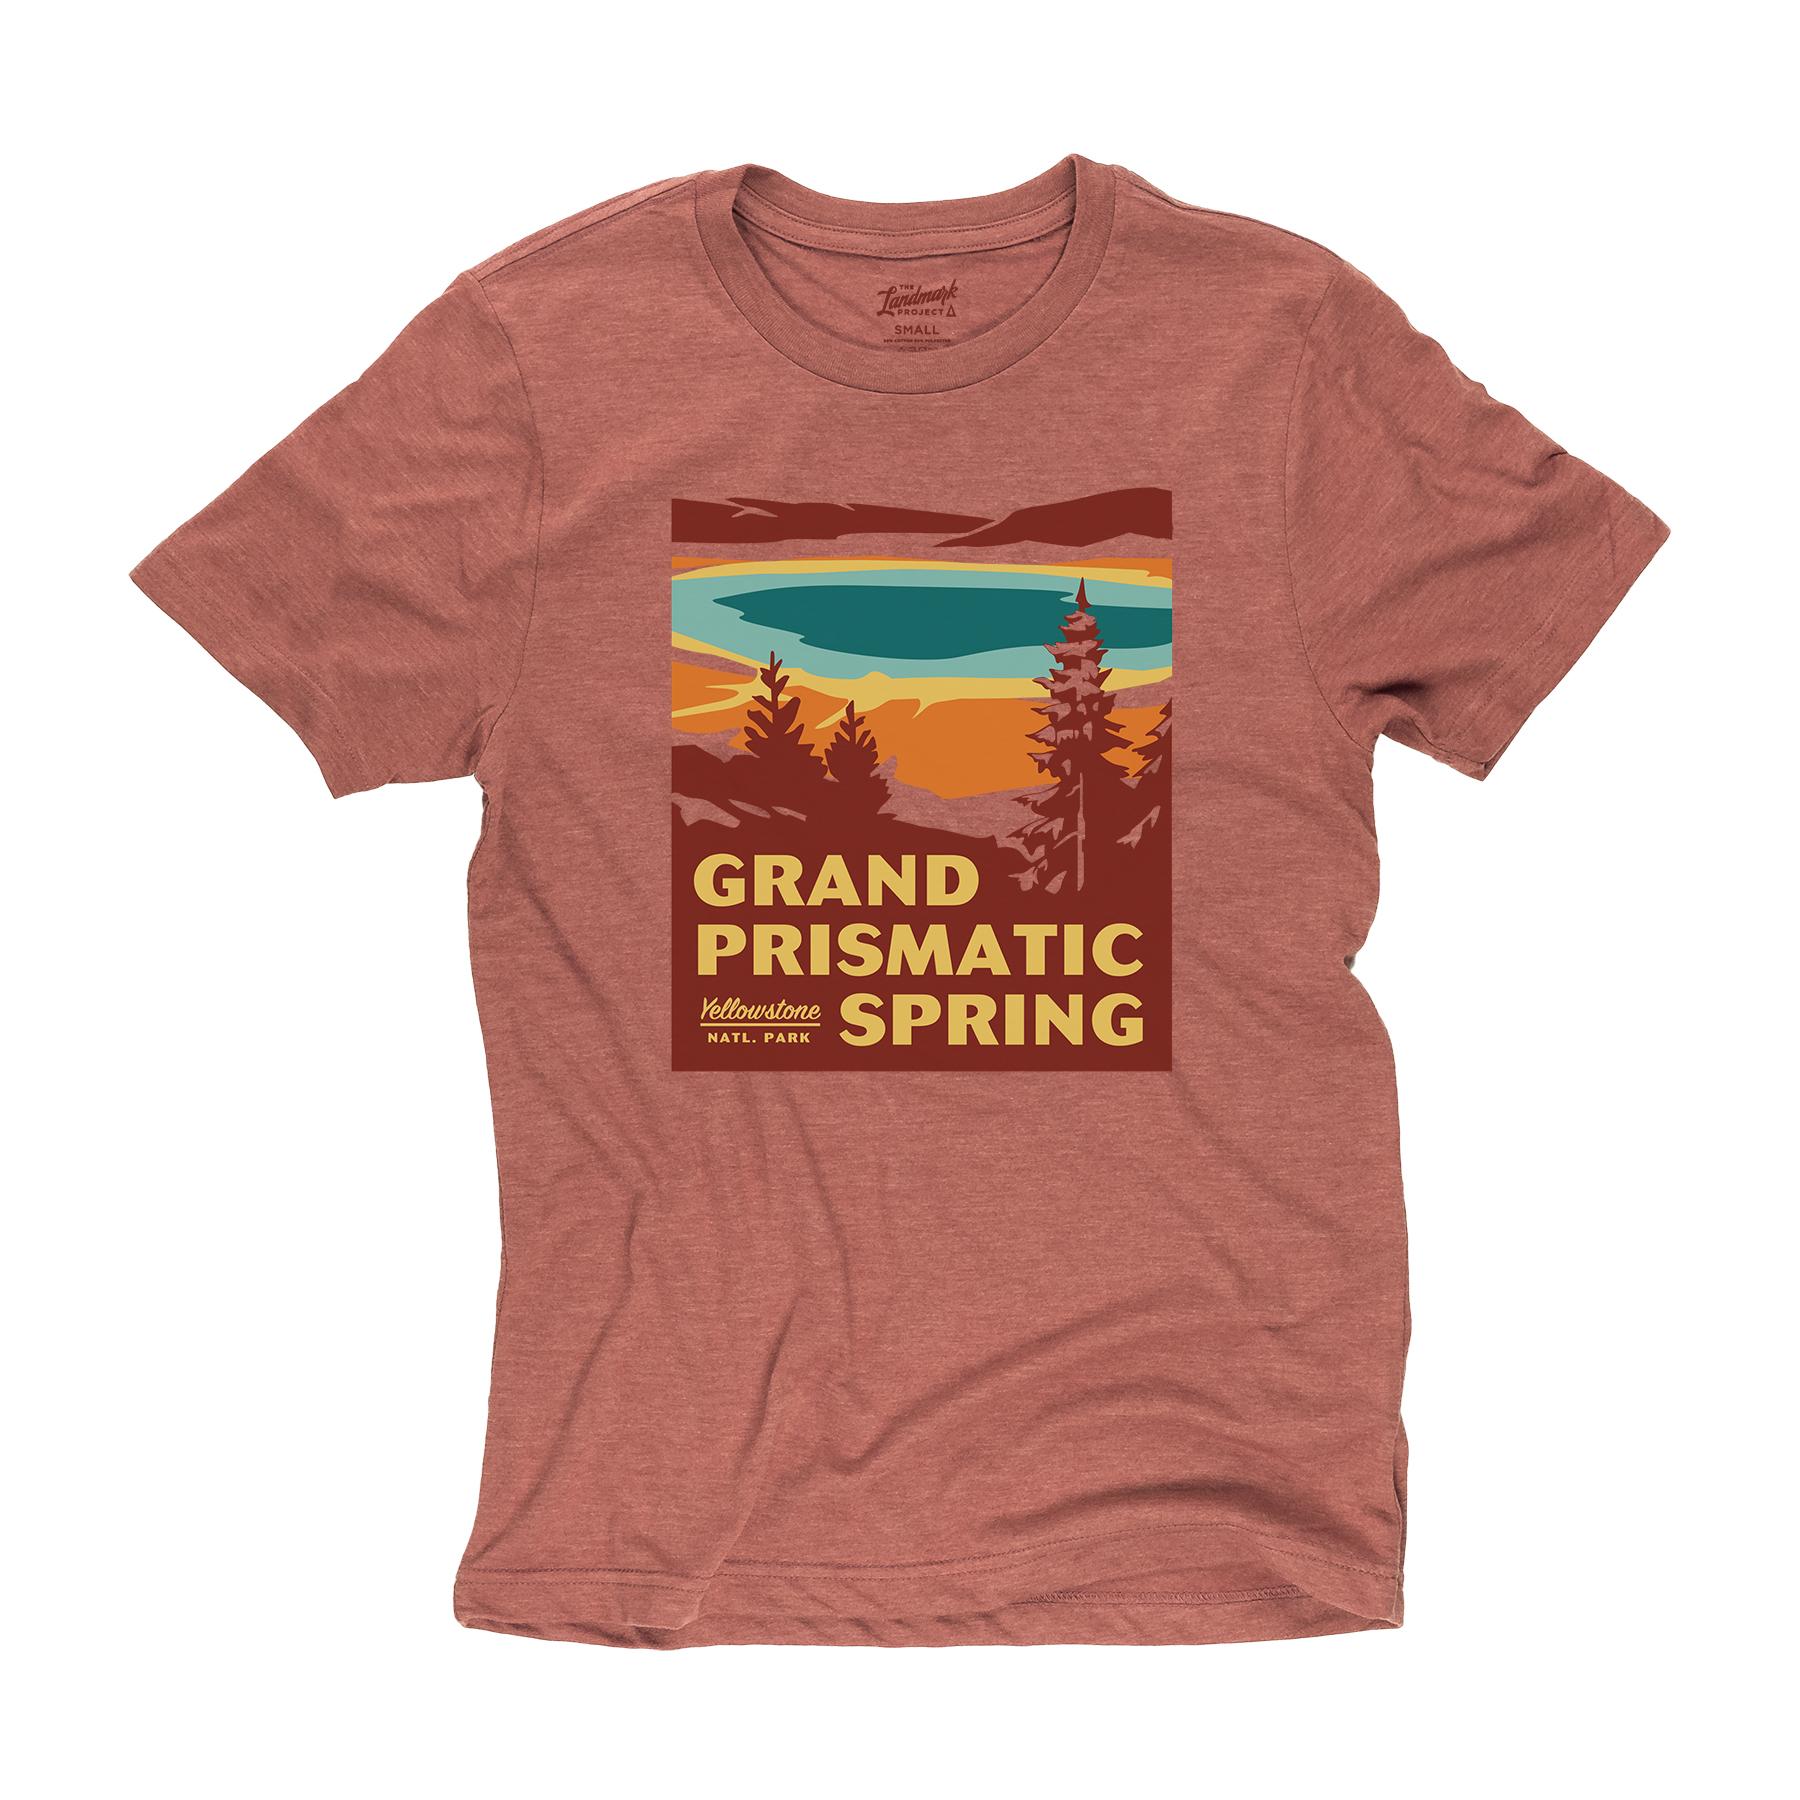 grand-prismatic-redrocks-tee.jpg